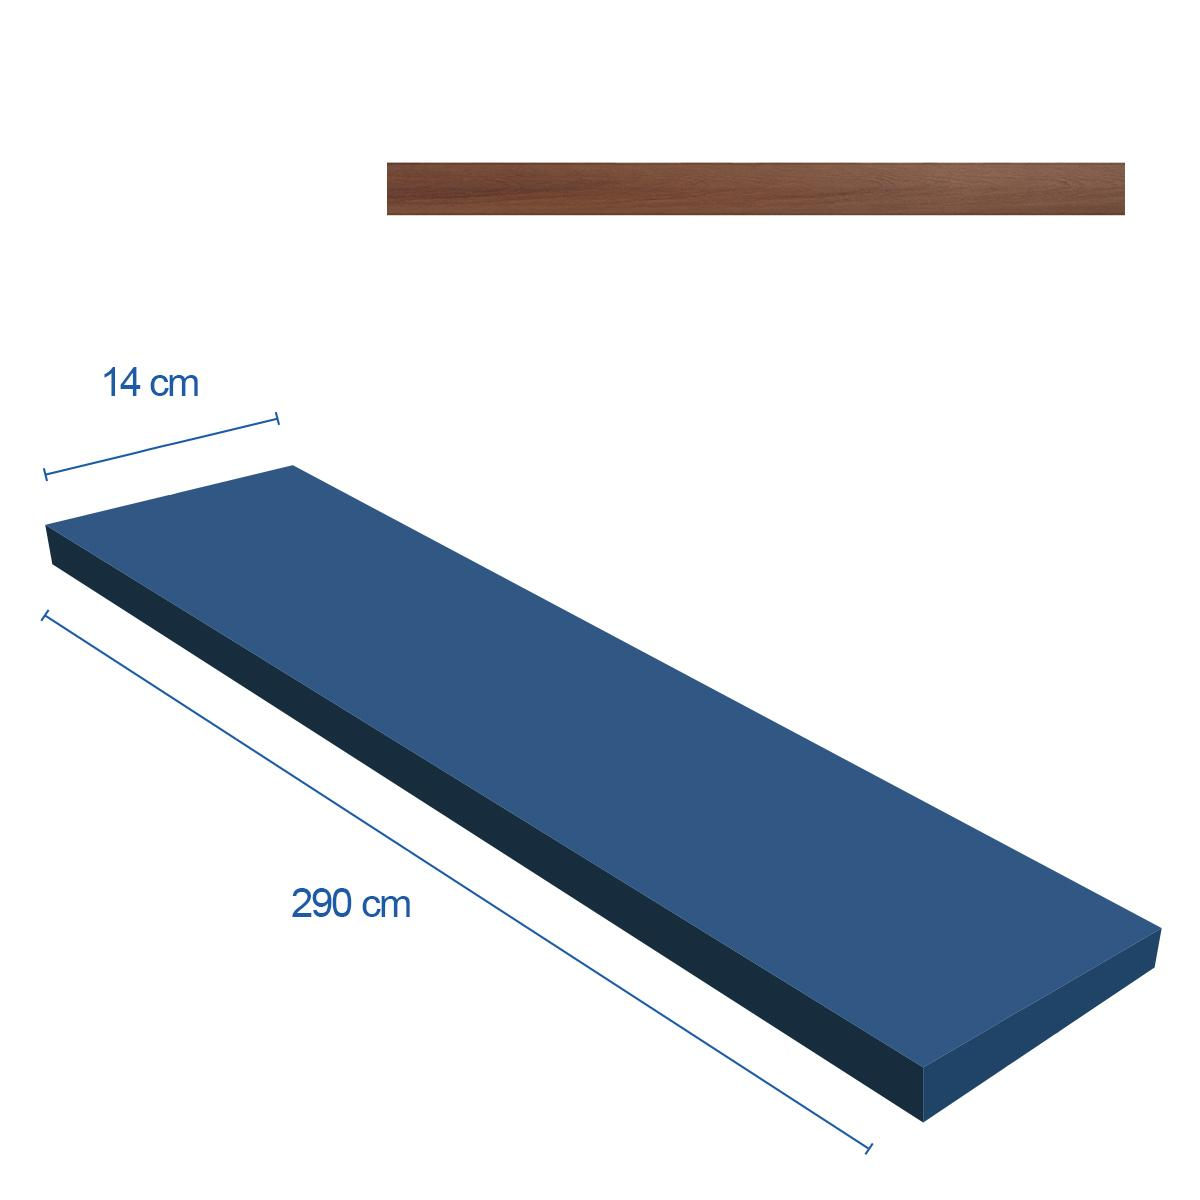 Piso Deck Cedar Ladrillo Mate - 14X290 - 0.42 m2